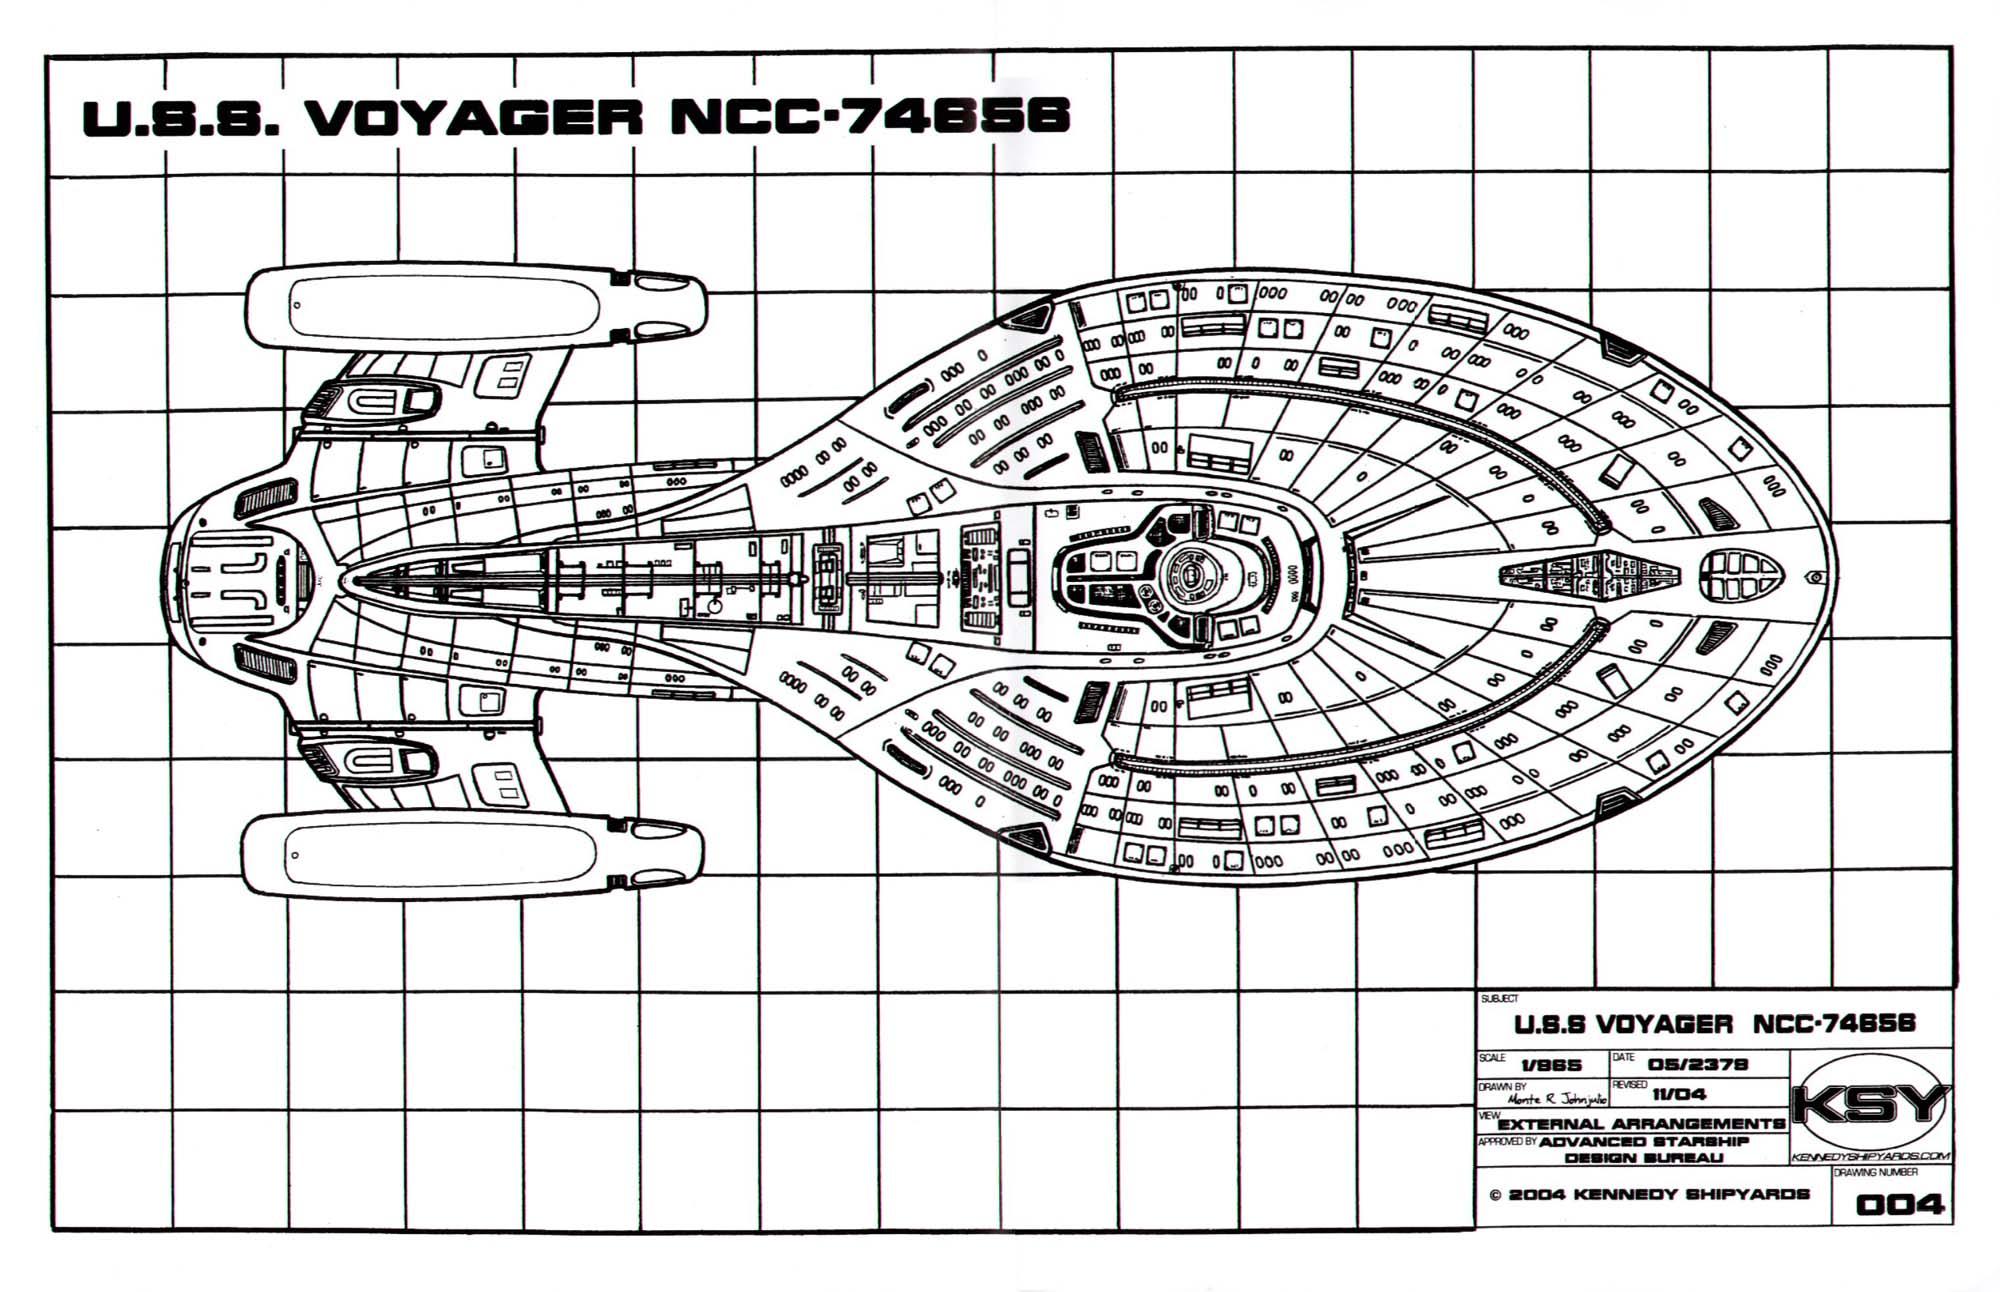 [QMVU_8575]  Star Trek Blueprints: Intrepid Class Starship U.S.S. Voyager NCC-74656 | Voyager Schematics |  | Cygnus-X1.Net